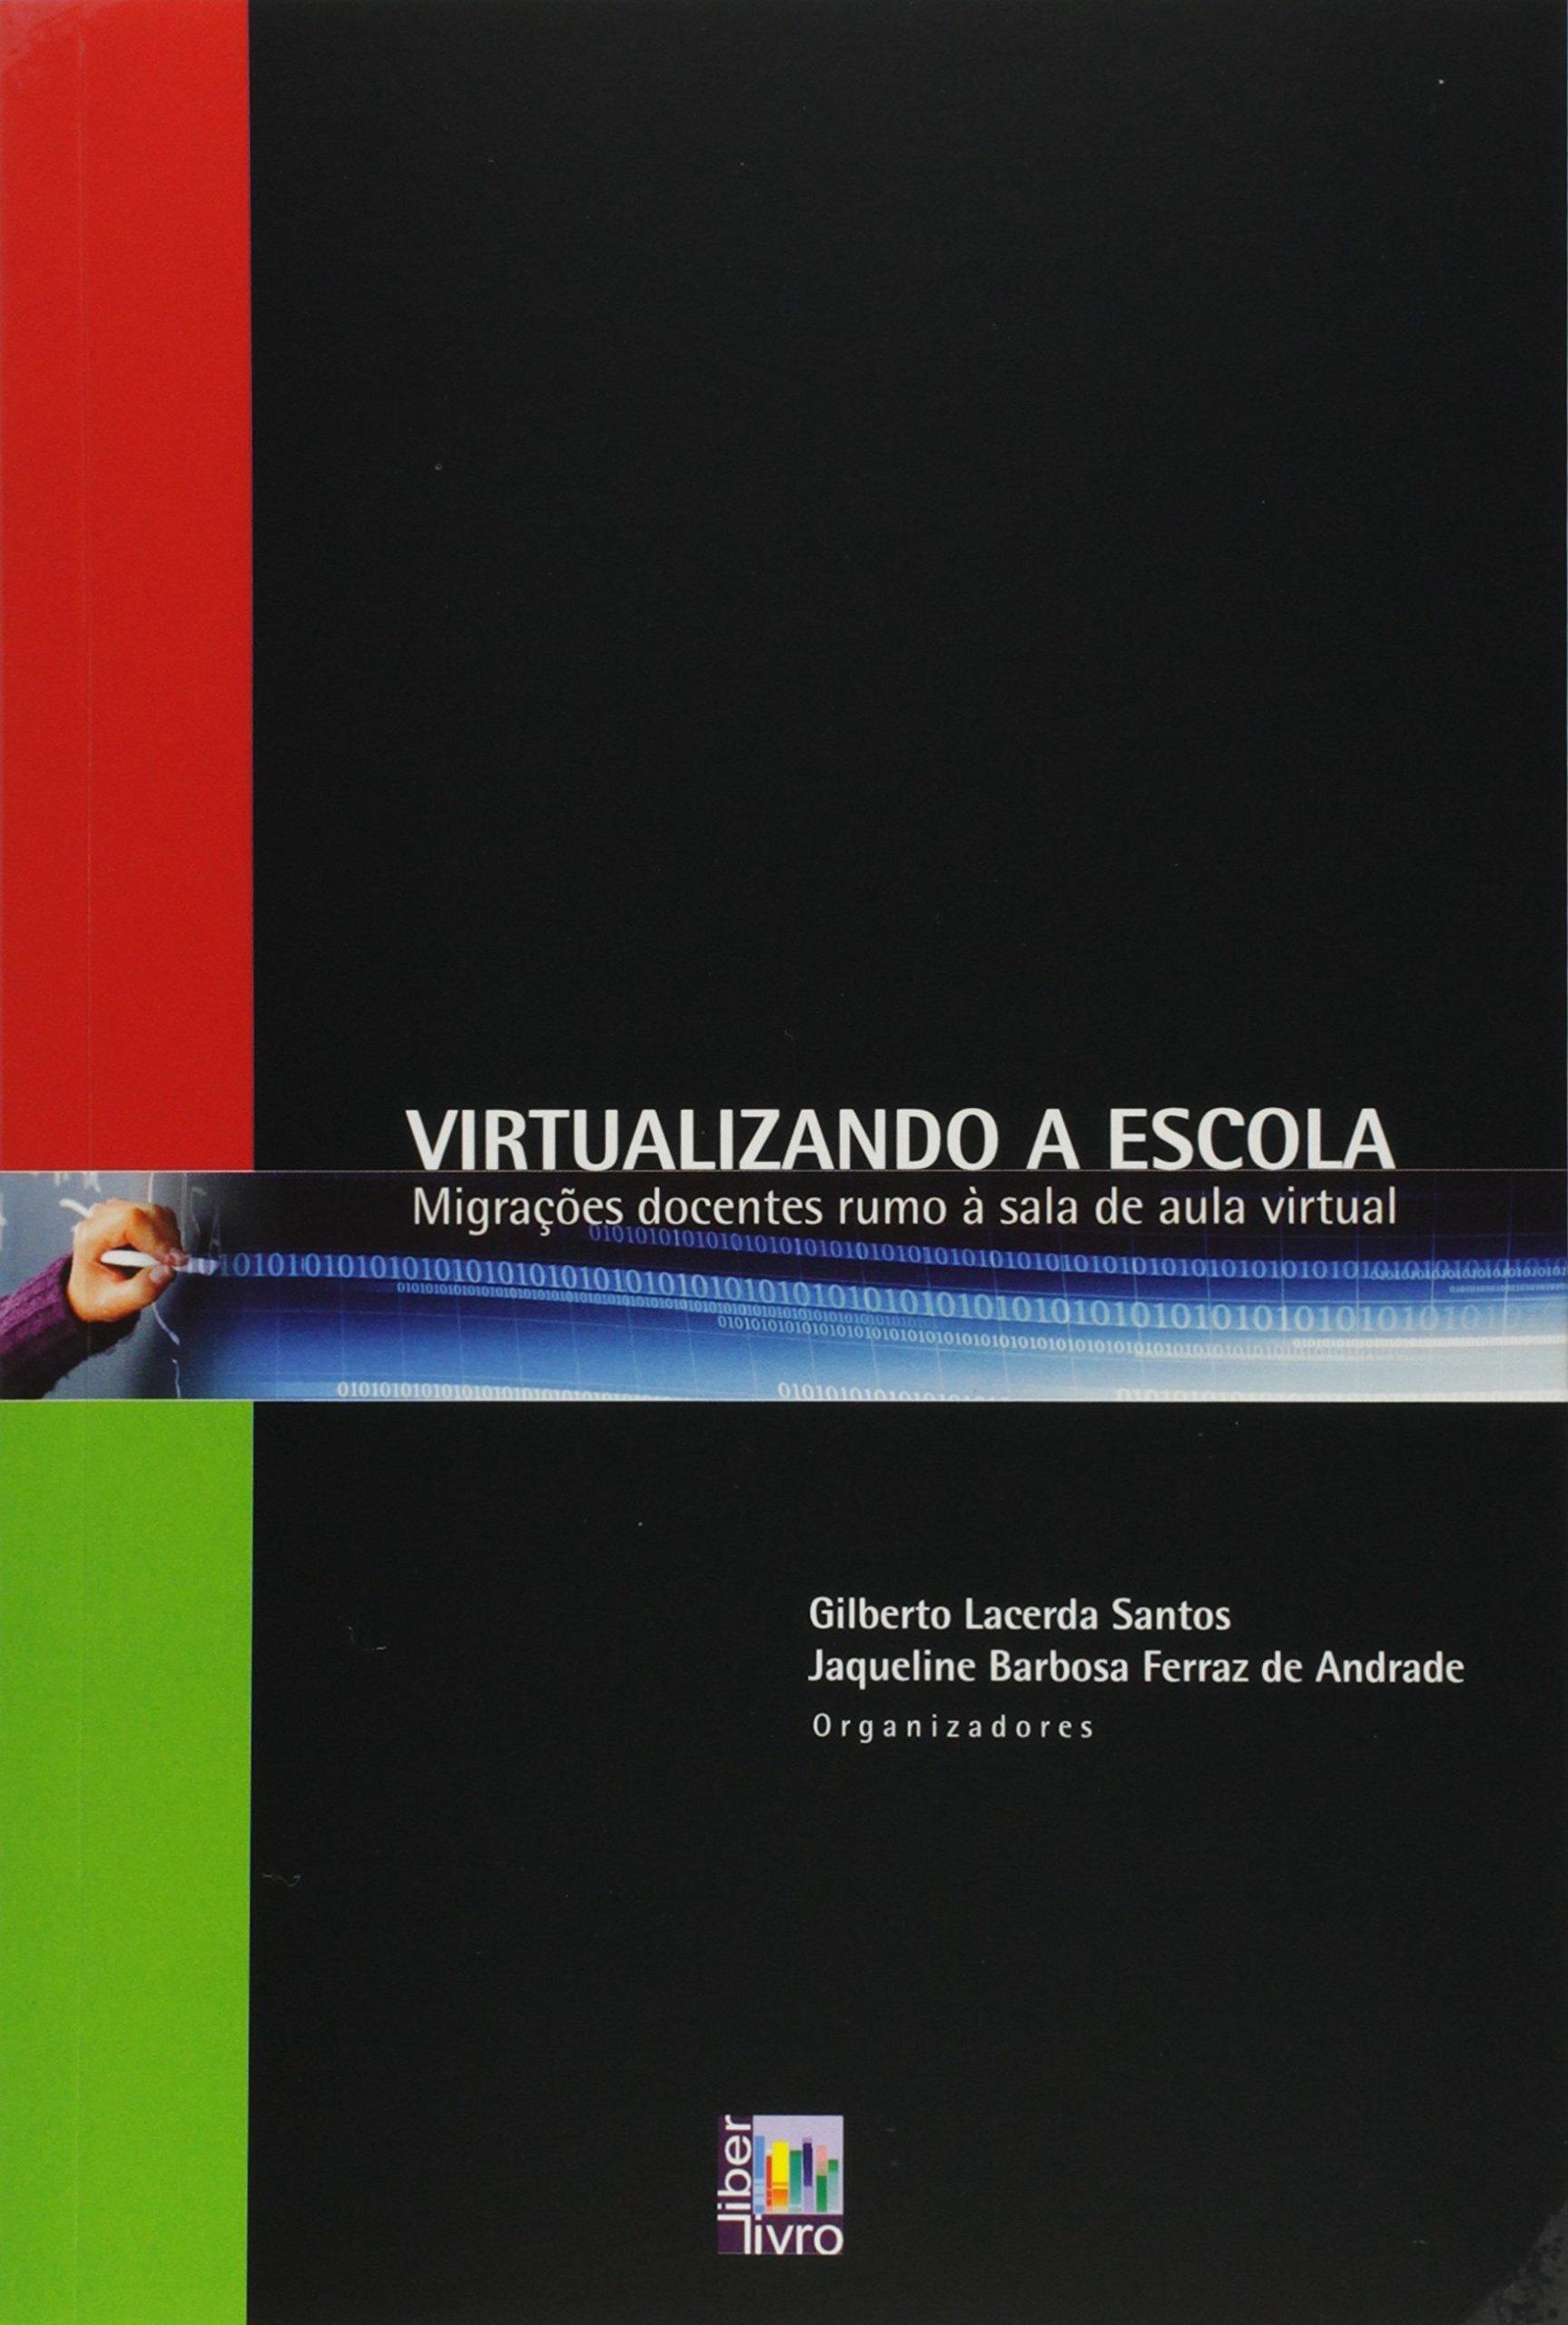 Virtualizando a Escola: Migracoes Docentes Rumo a Sala de Aula Virtural pdf